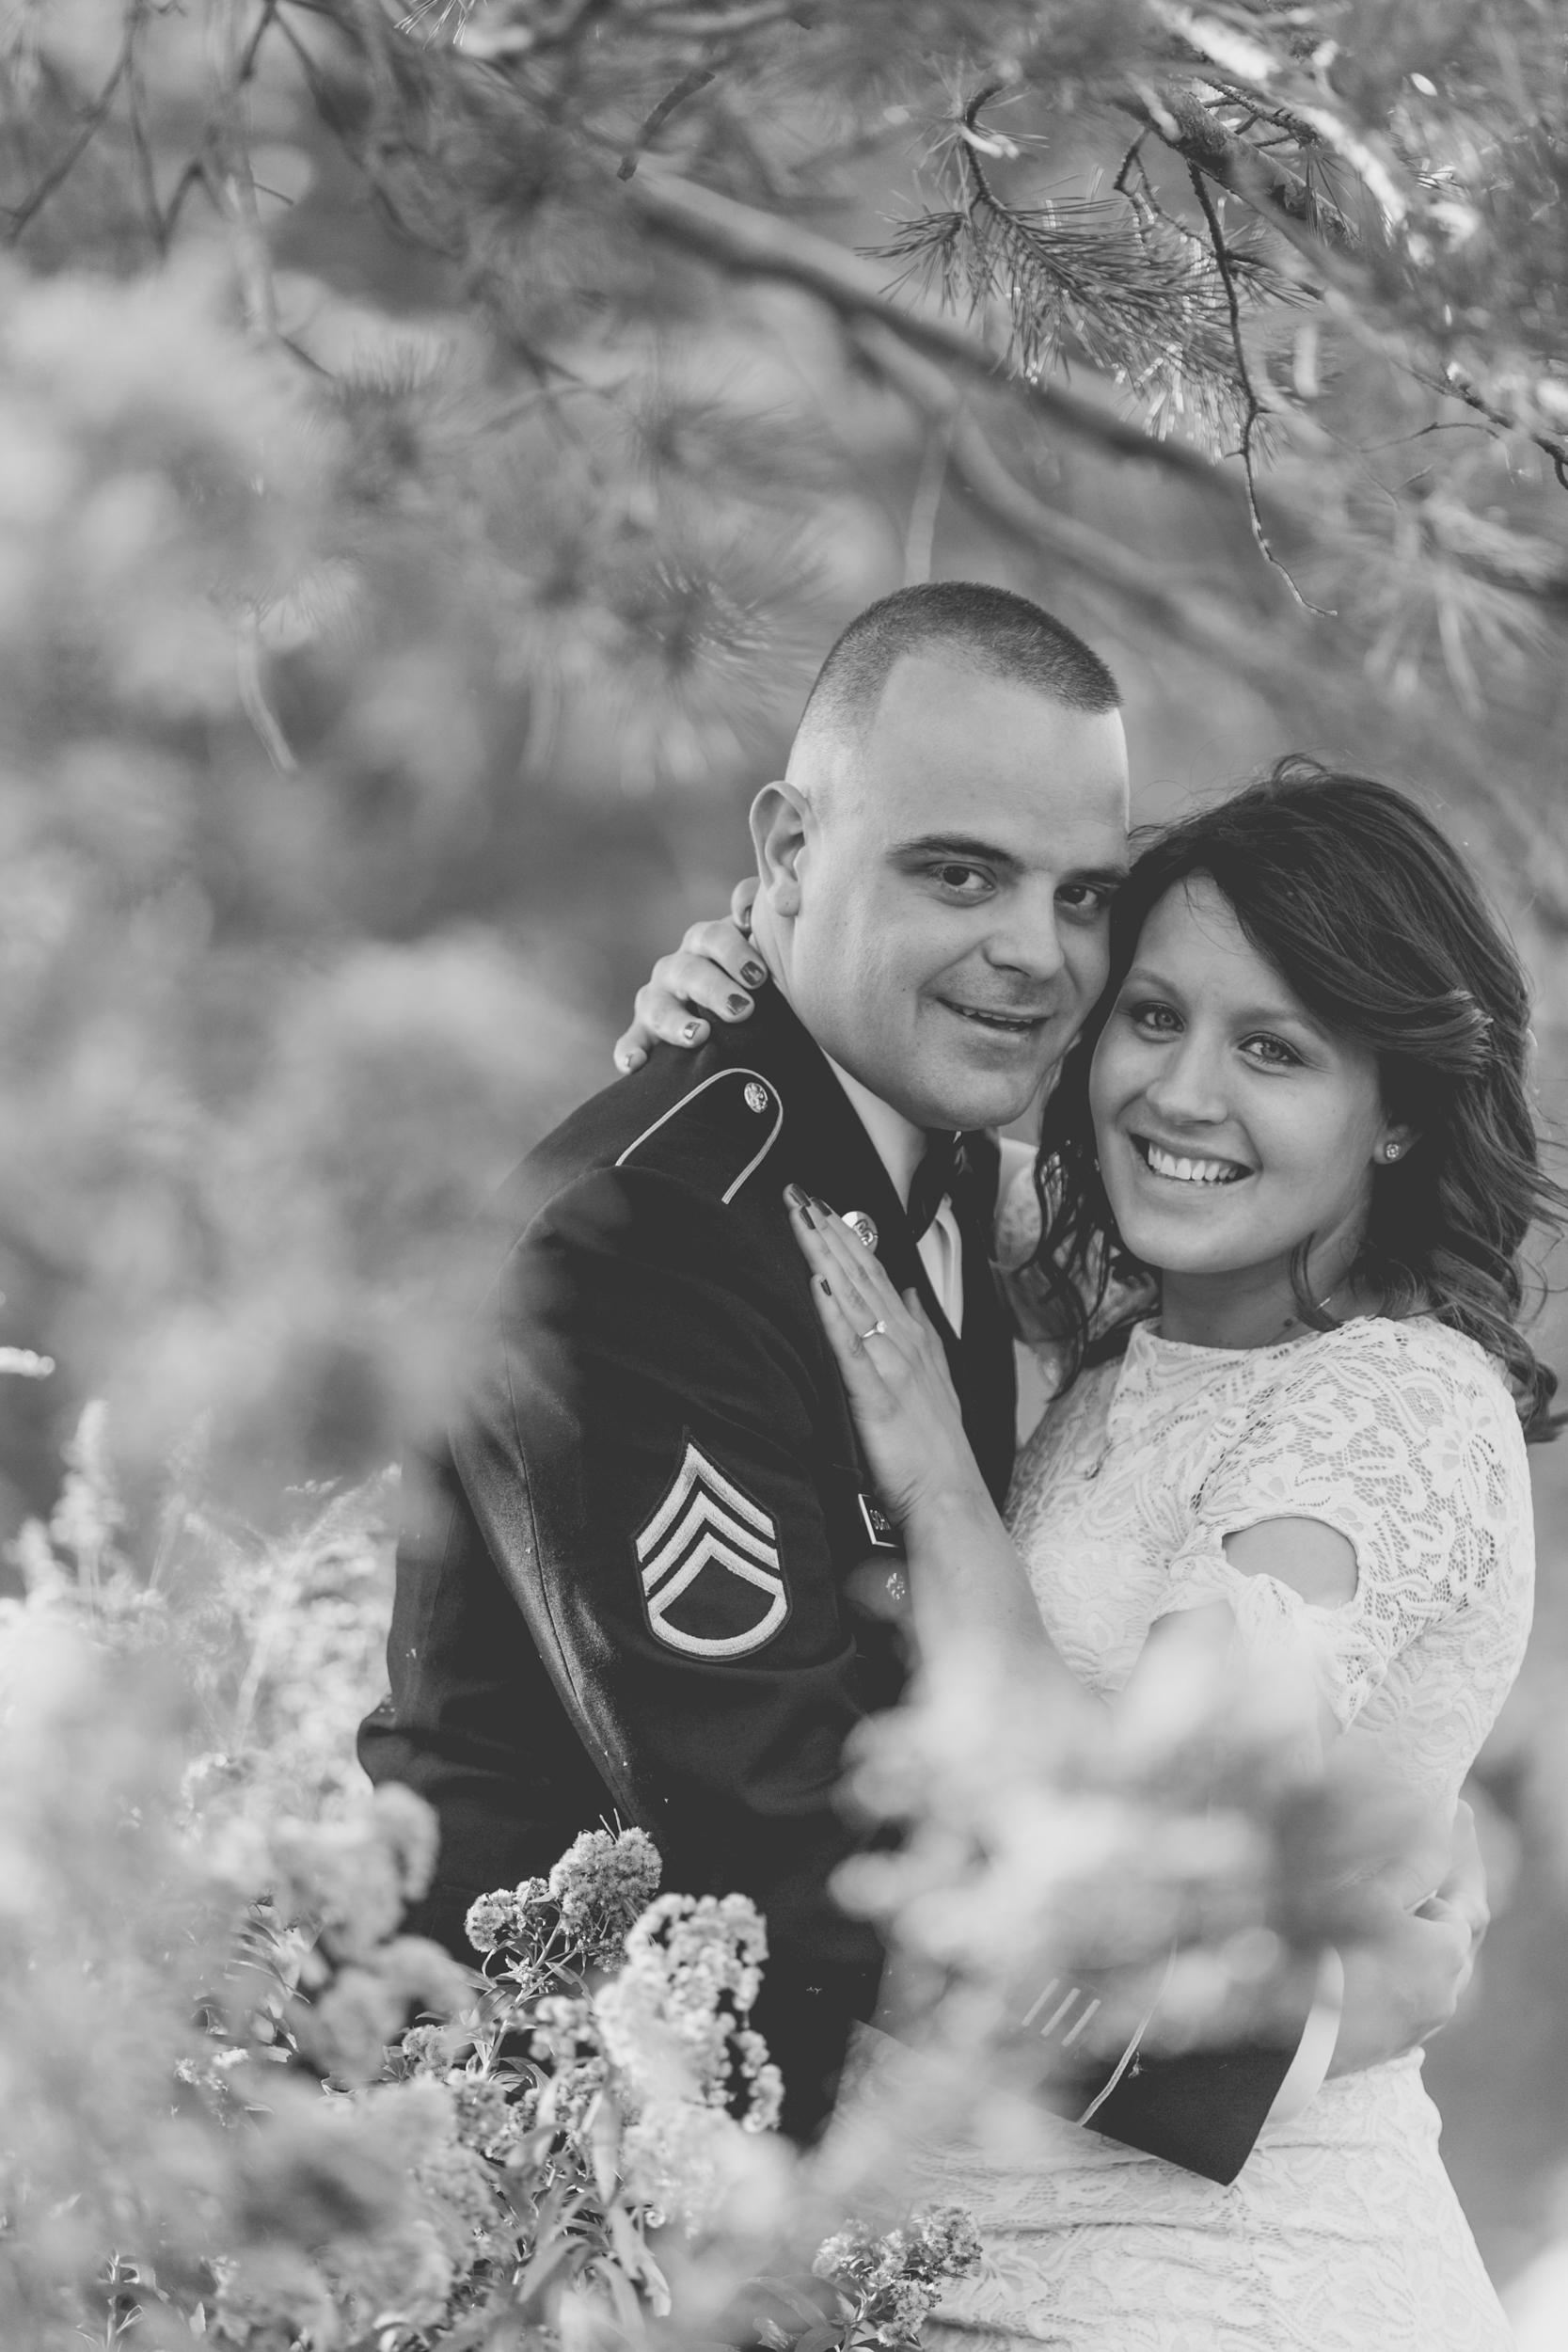 Fort Snelling Elopement St. Paul, MN, Fort Snelling Elopement, Military Elopement, Intimate Military Wedding, intimate elopement wedding-www.rachelsmak.com18.jpg